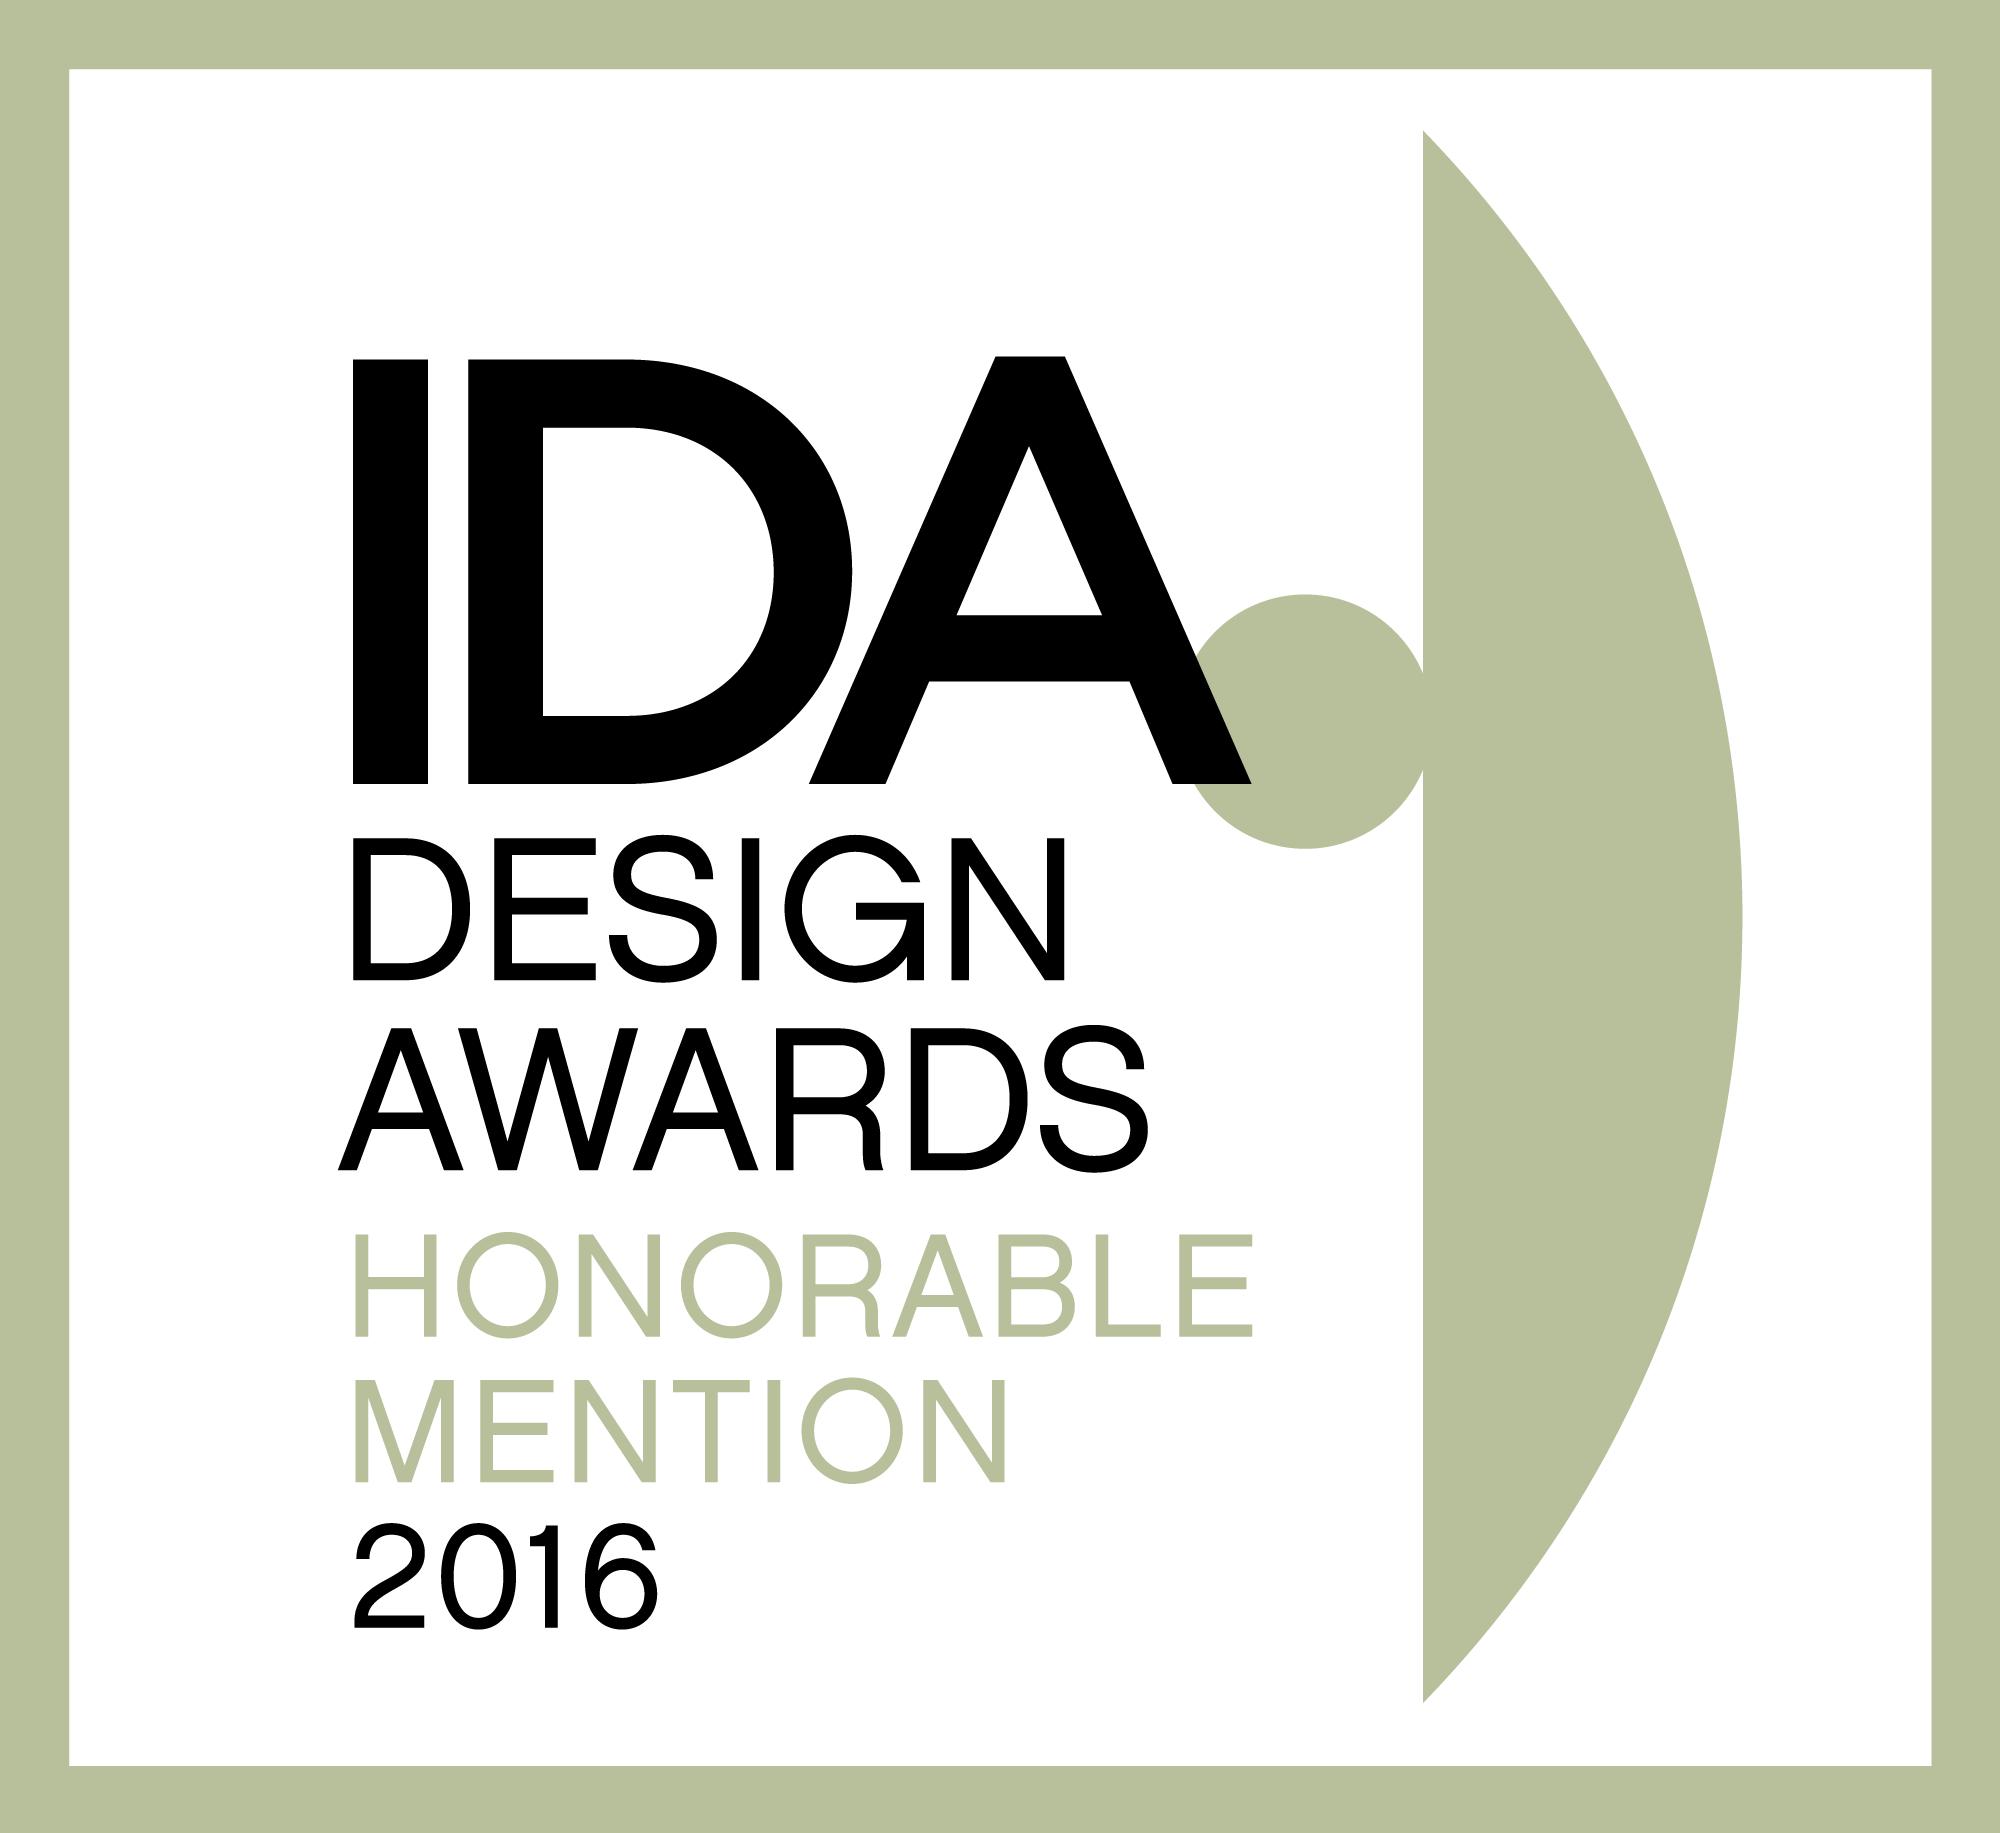 IDA2016-hm- JOIAS.png